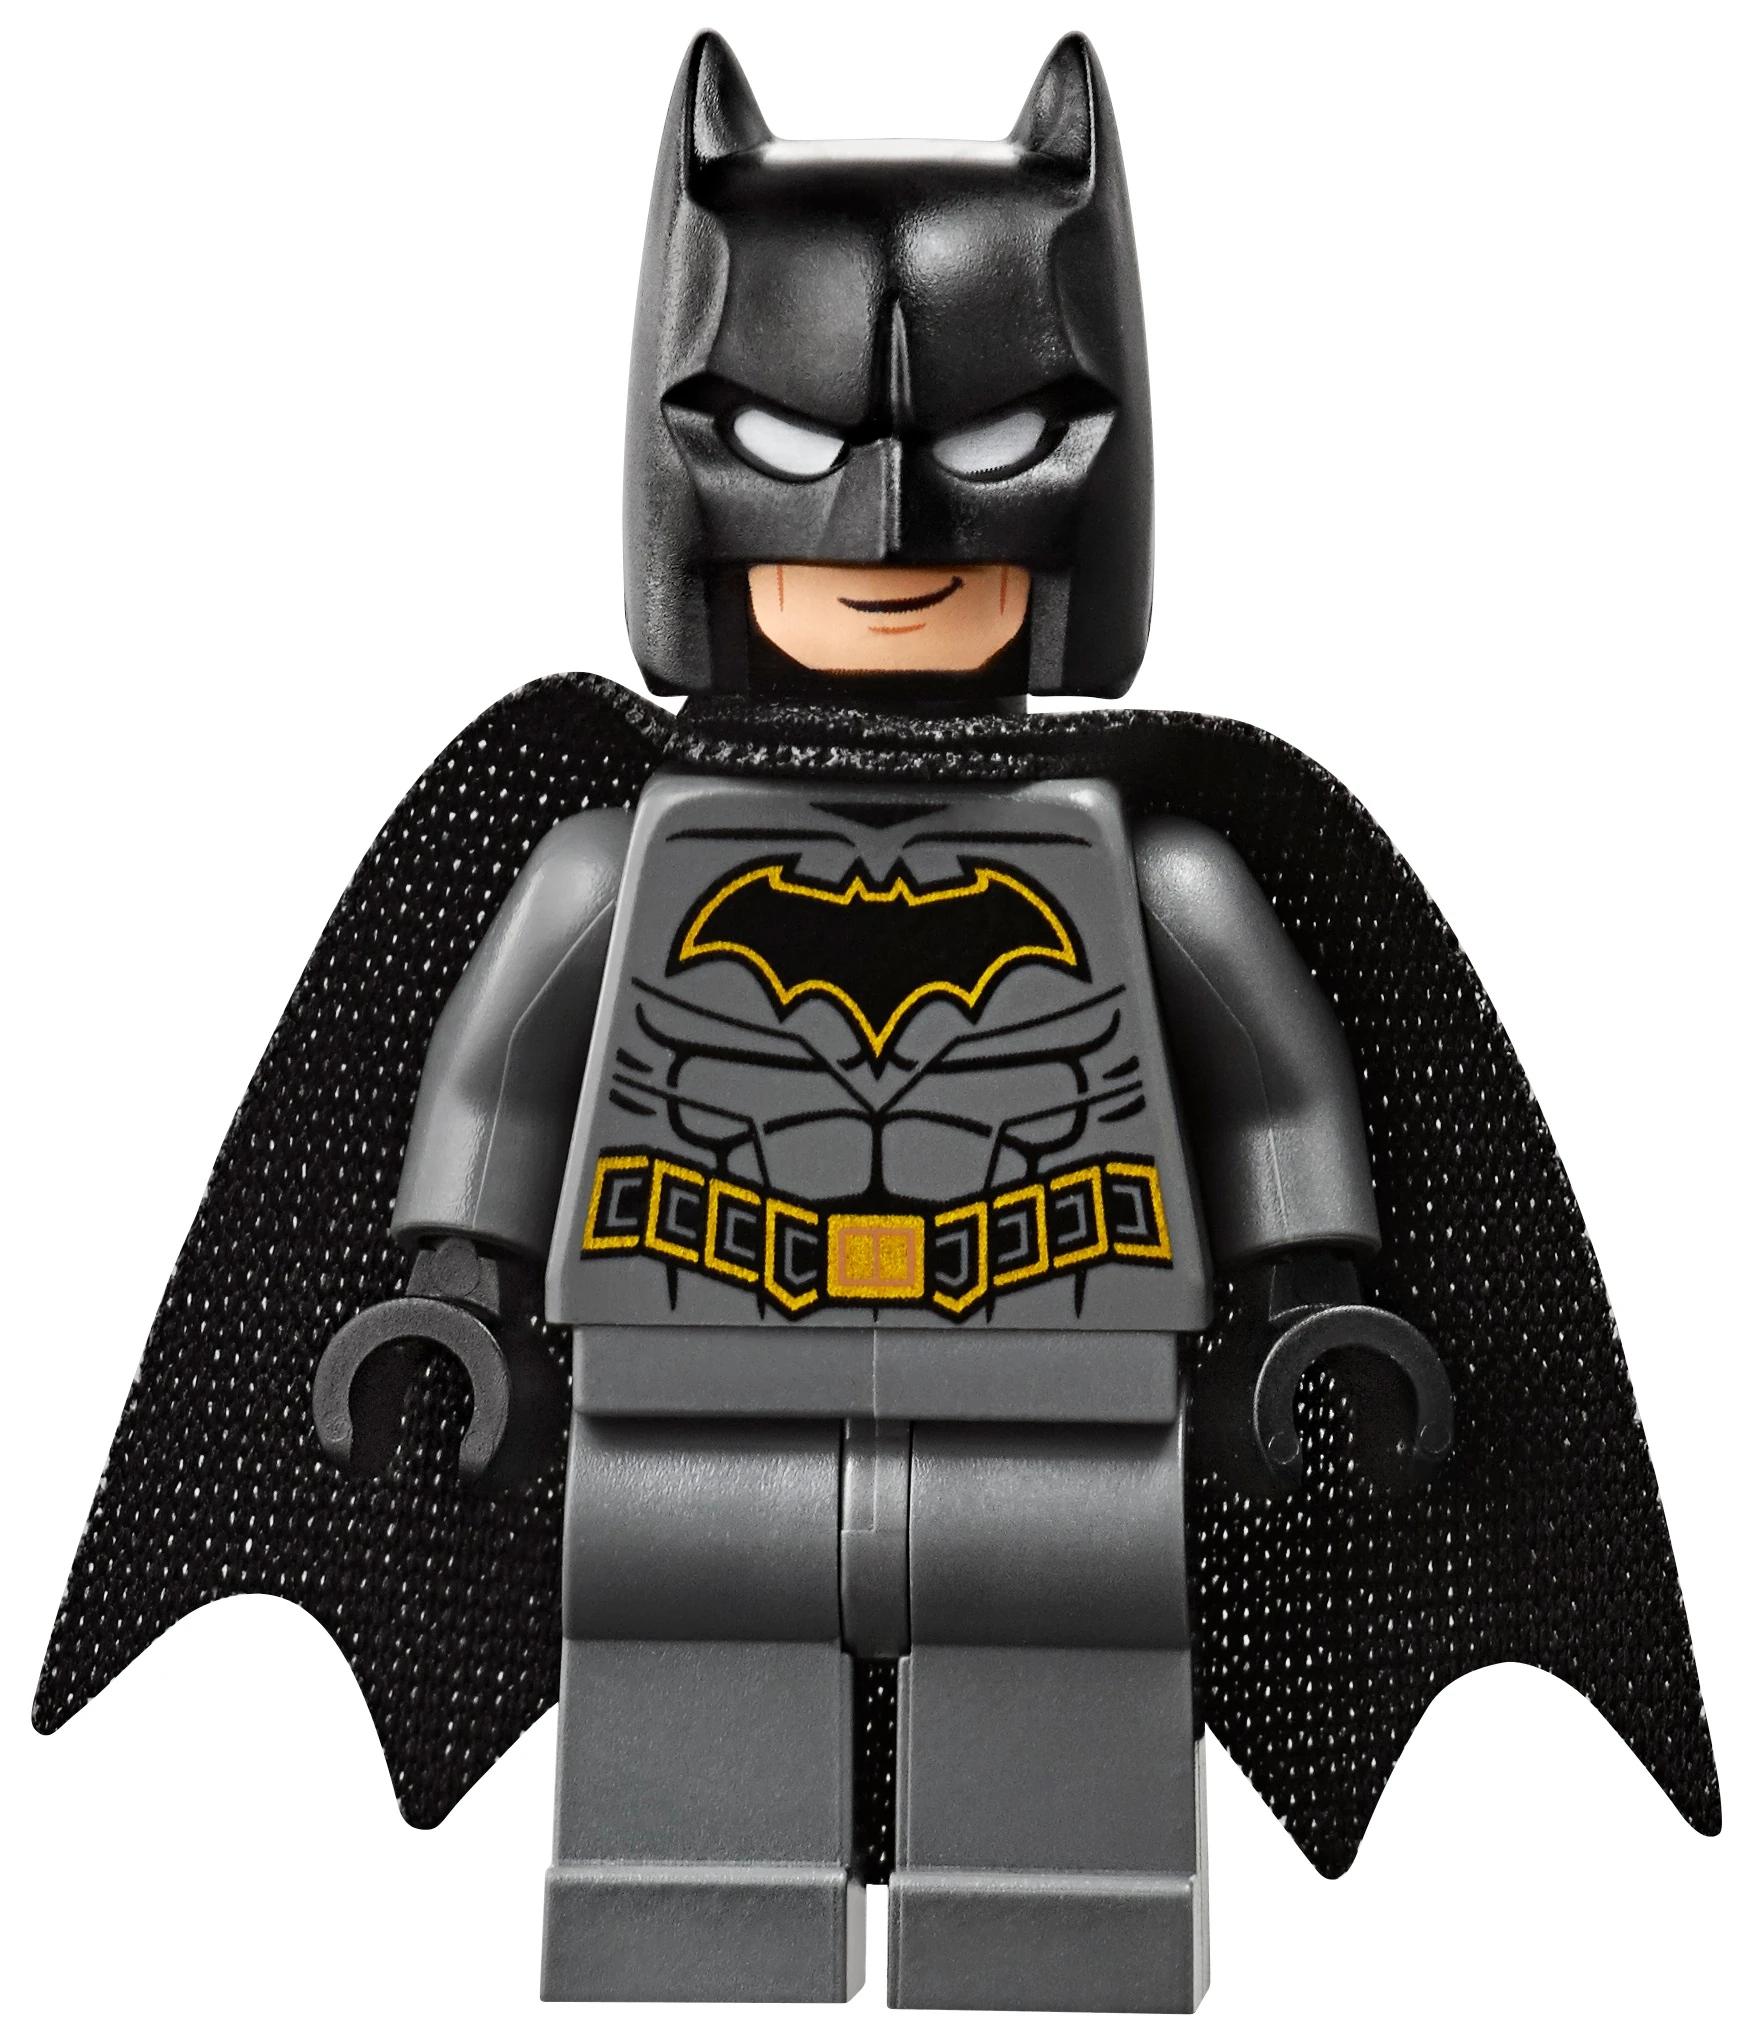 ORIGINAL MINIFIGURE LEGO SUPER HEROES DC COMICS MINIFIGURA BEAST BOY SET 76035